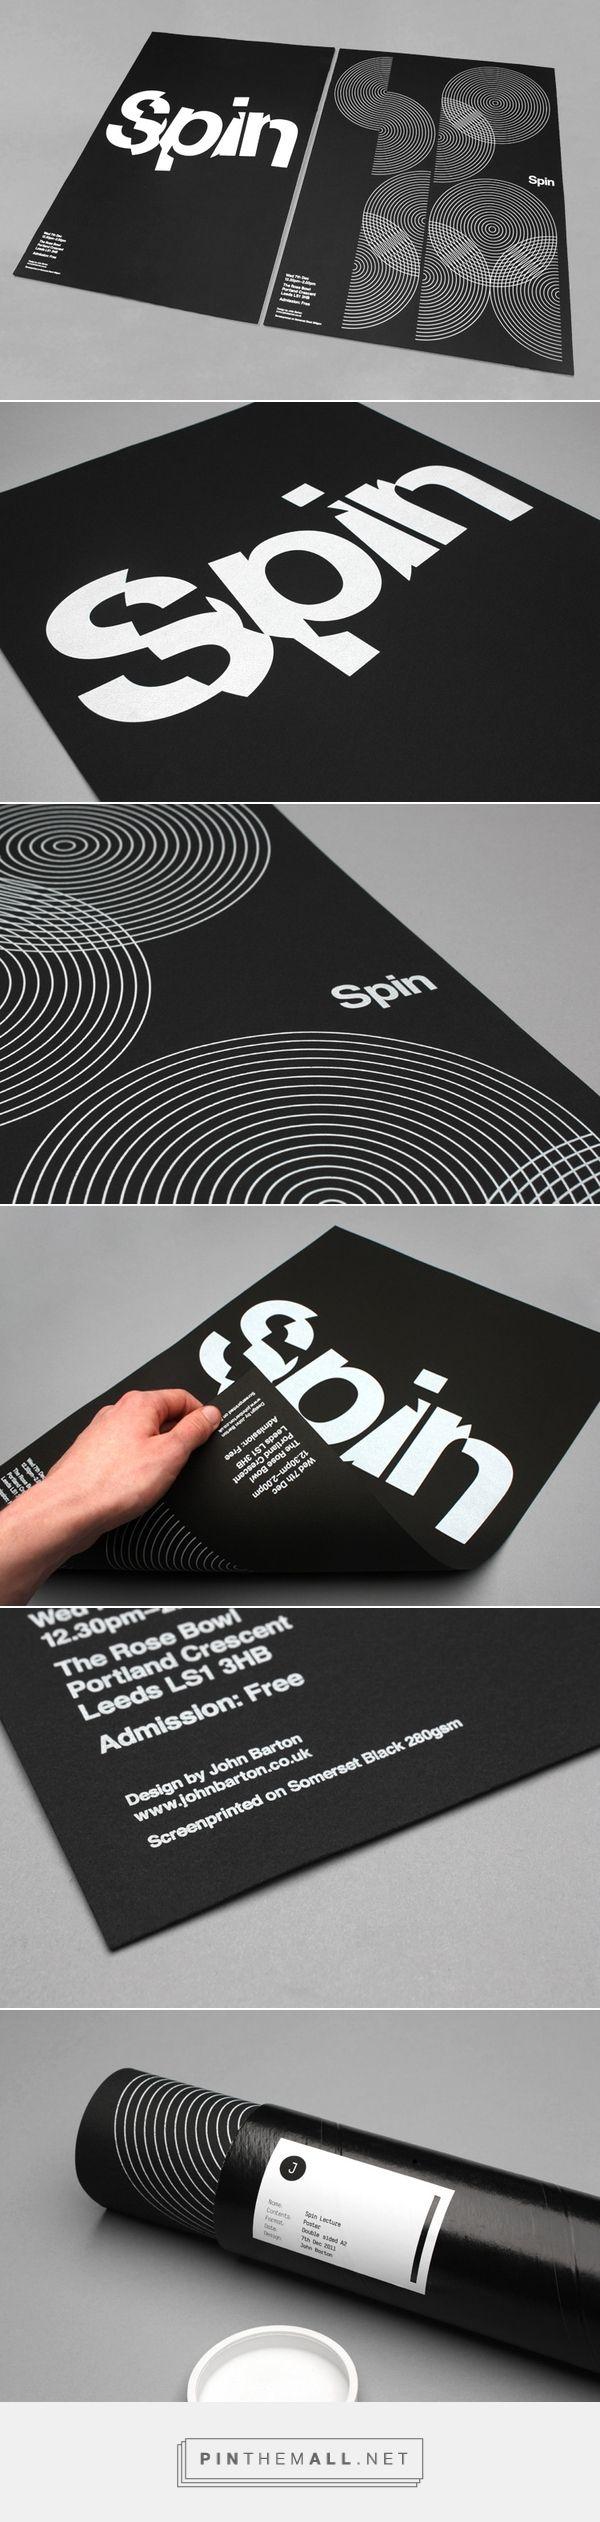 Spin by John Barton